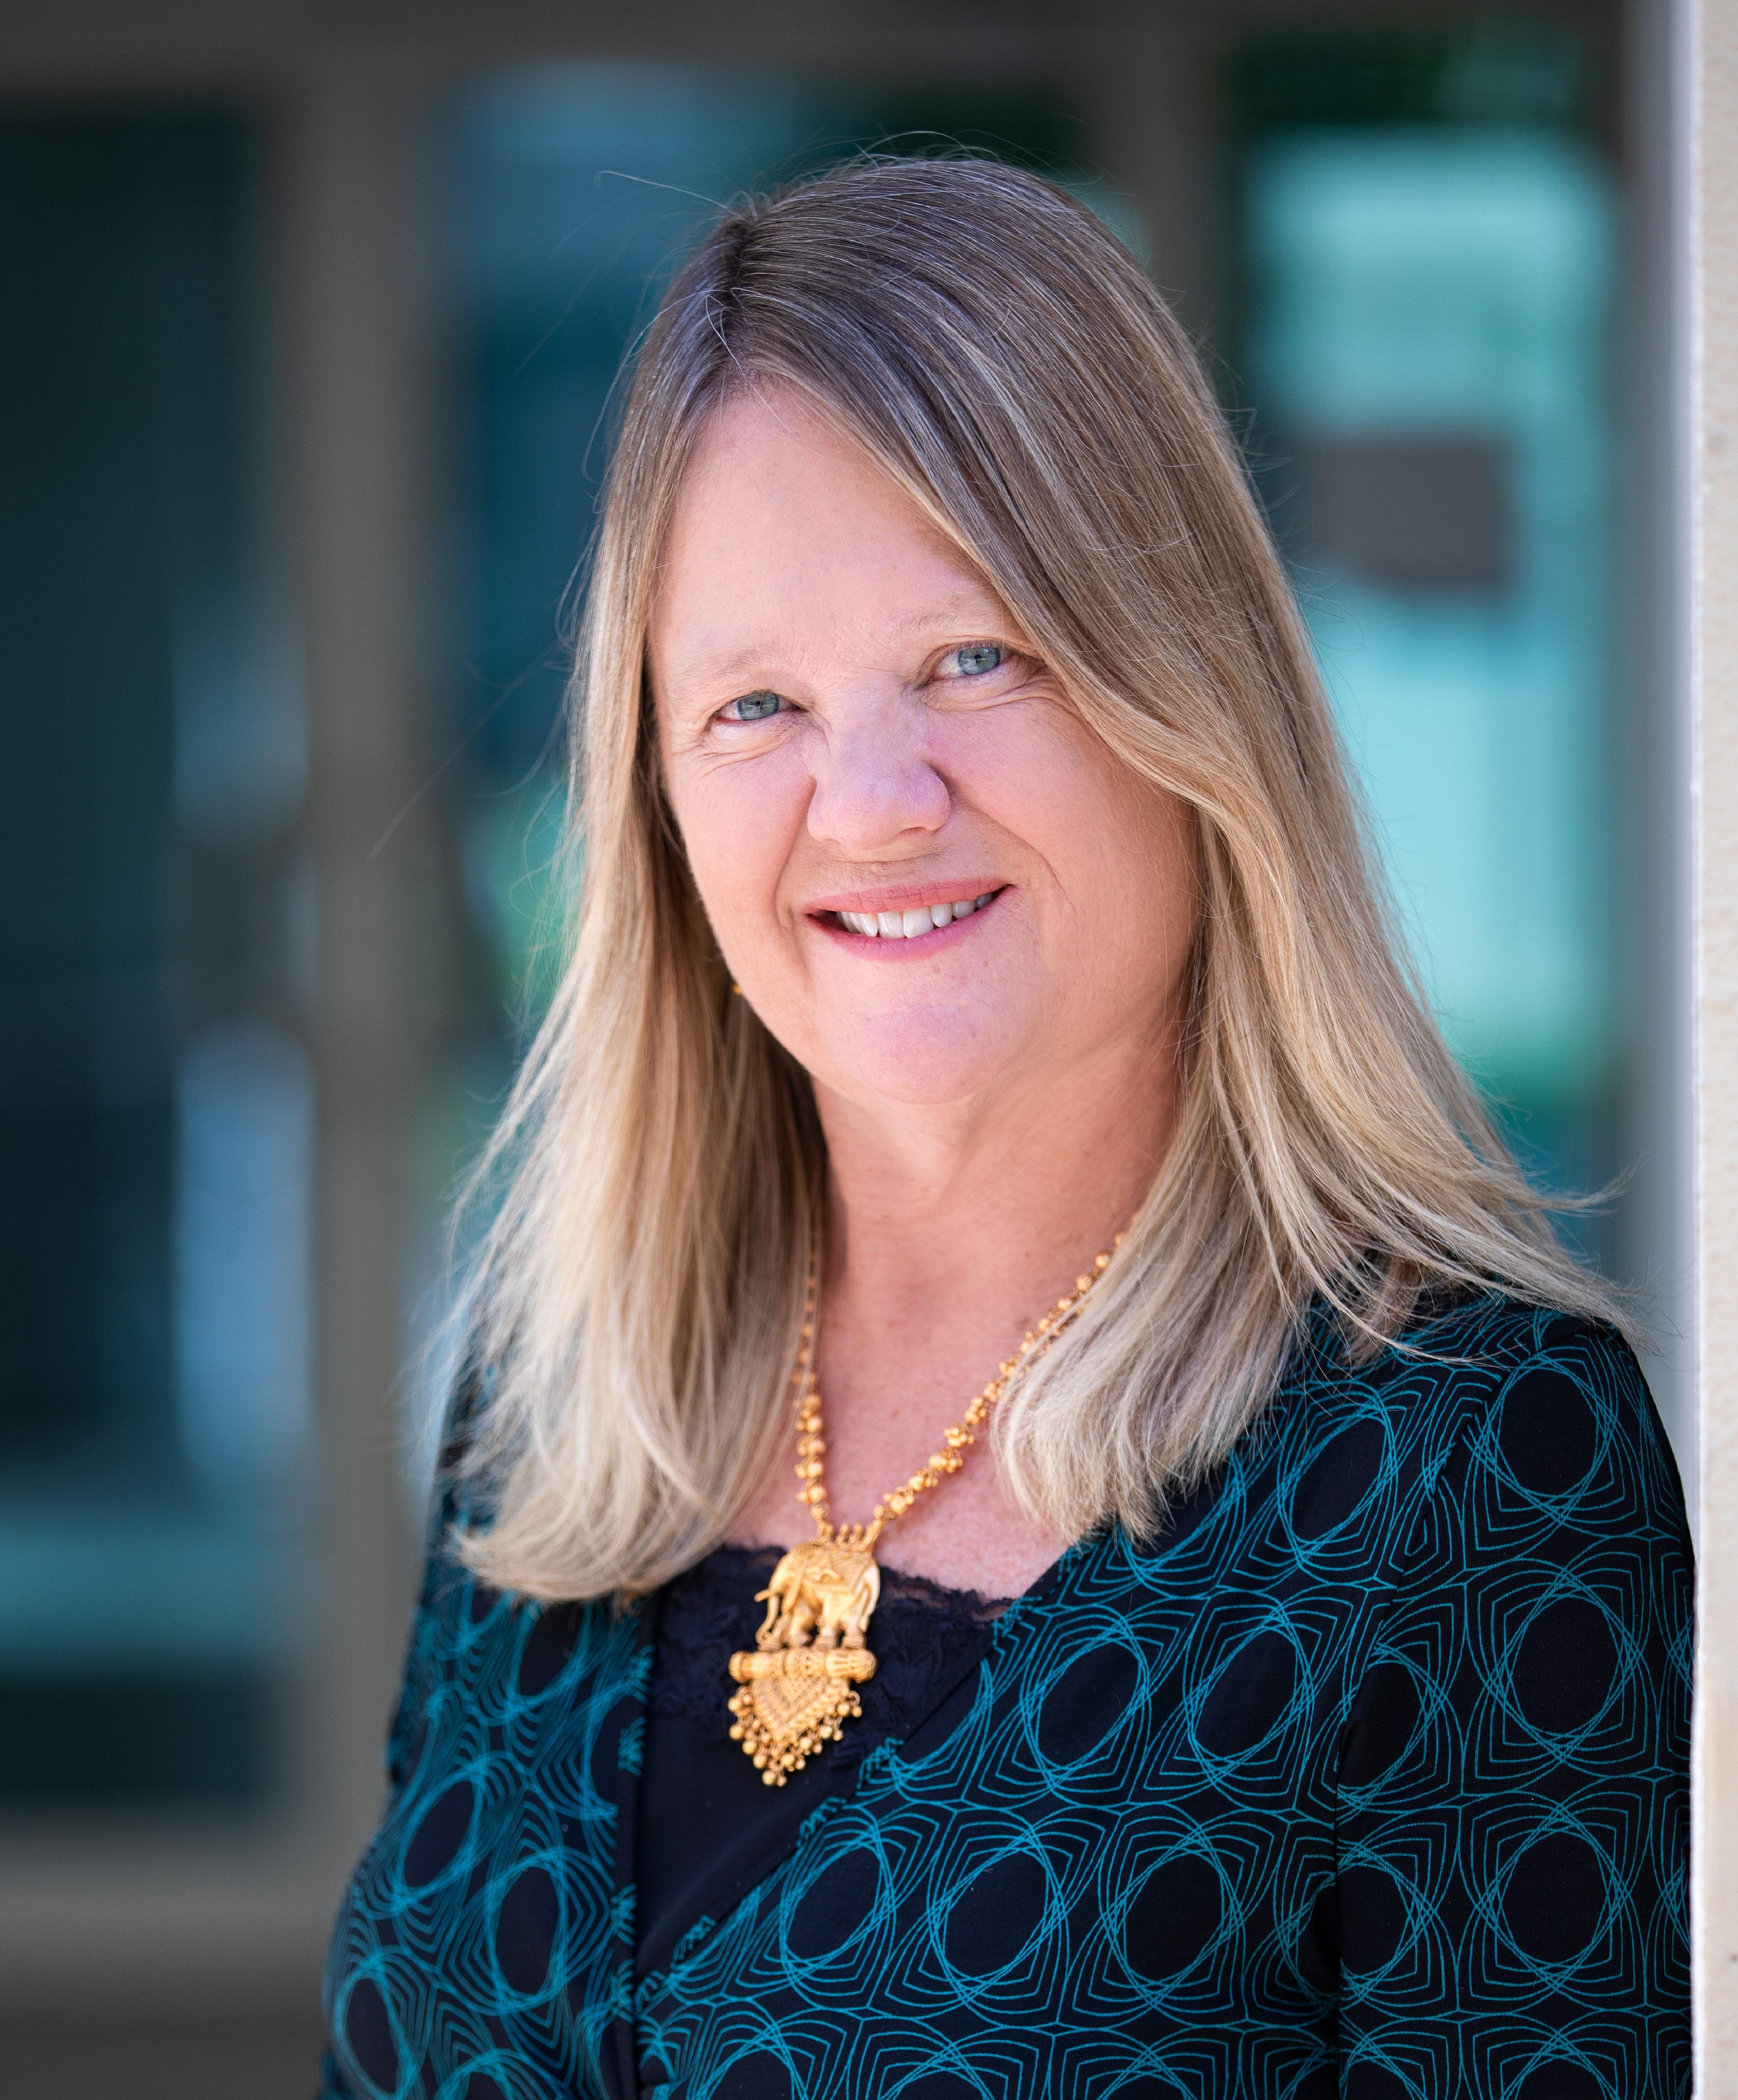 4 Best Online Teaching Strategies for Quantitative Subjects - Dr. Monica Gallant writes in Edarabia